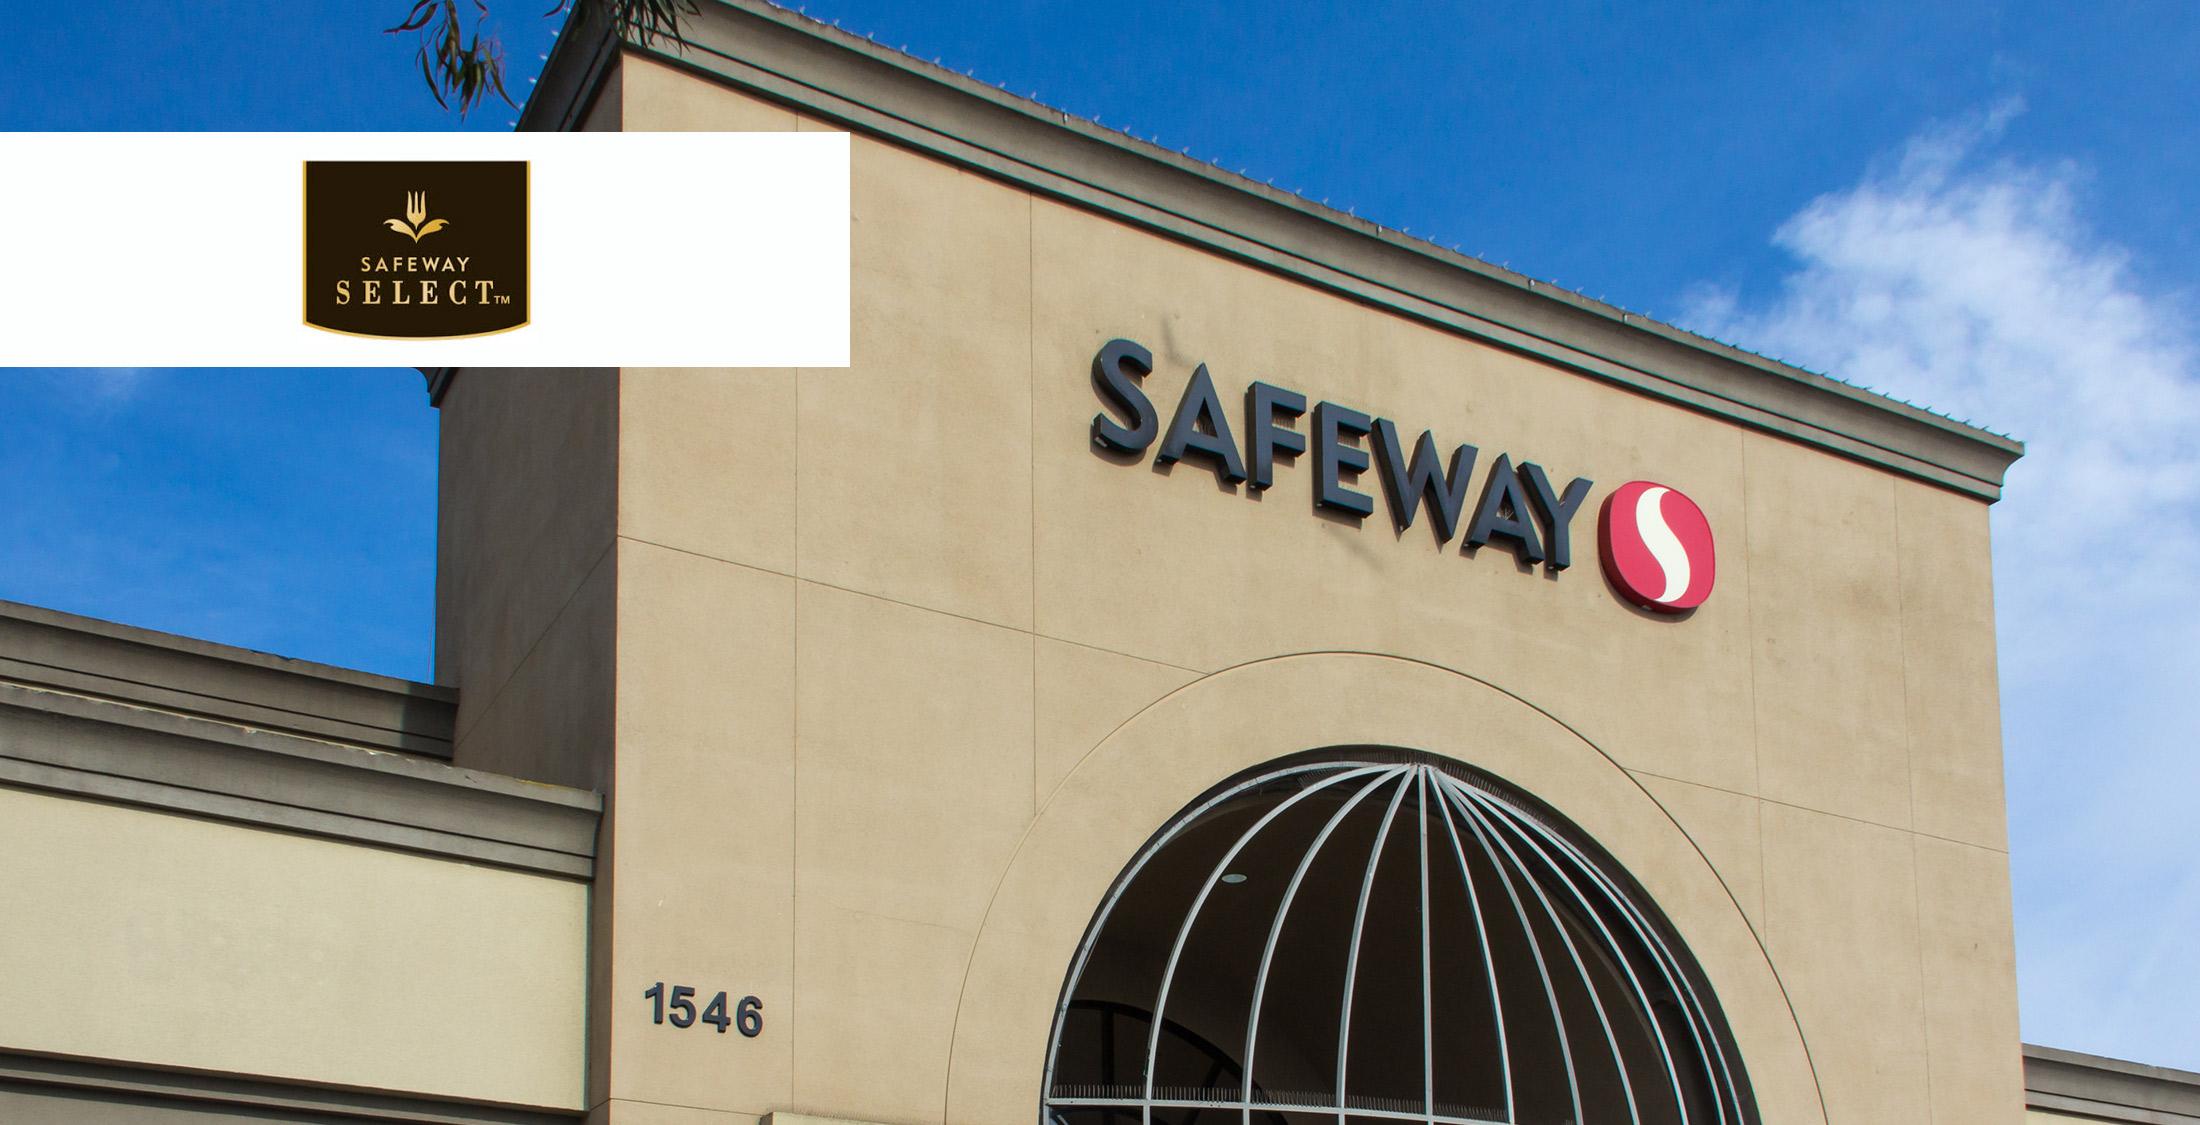 Safeway Select